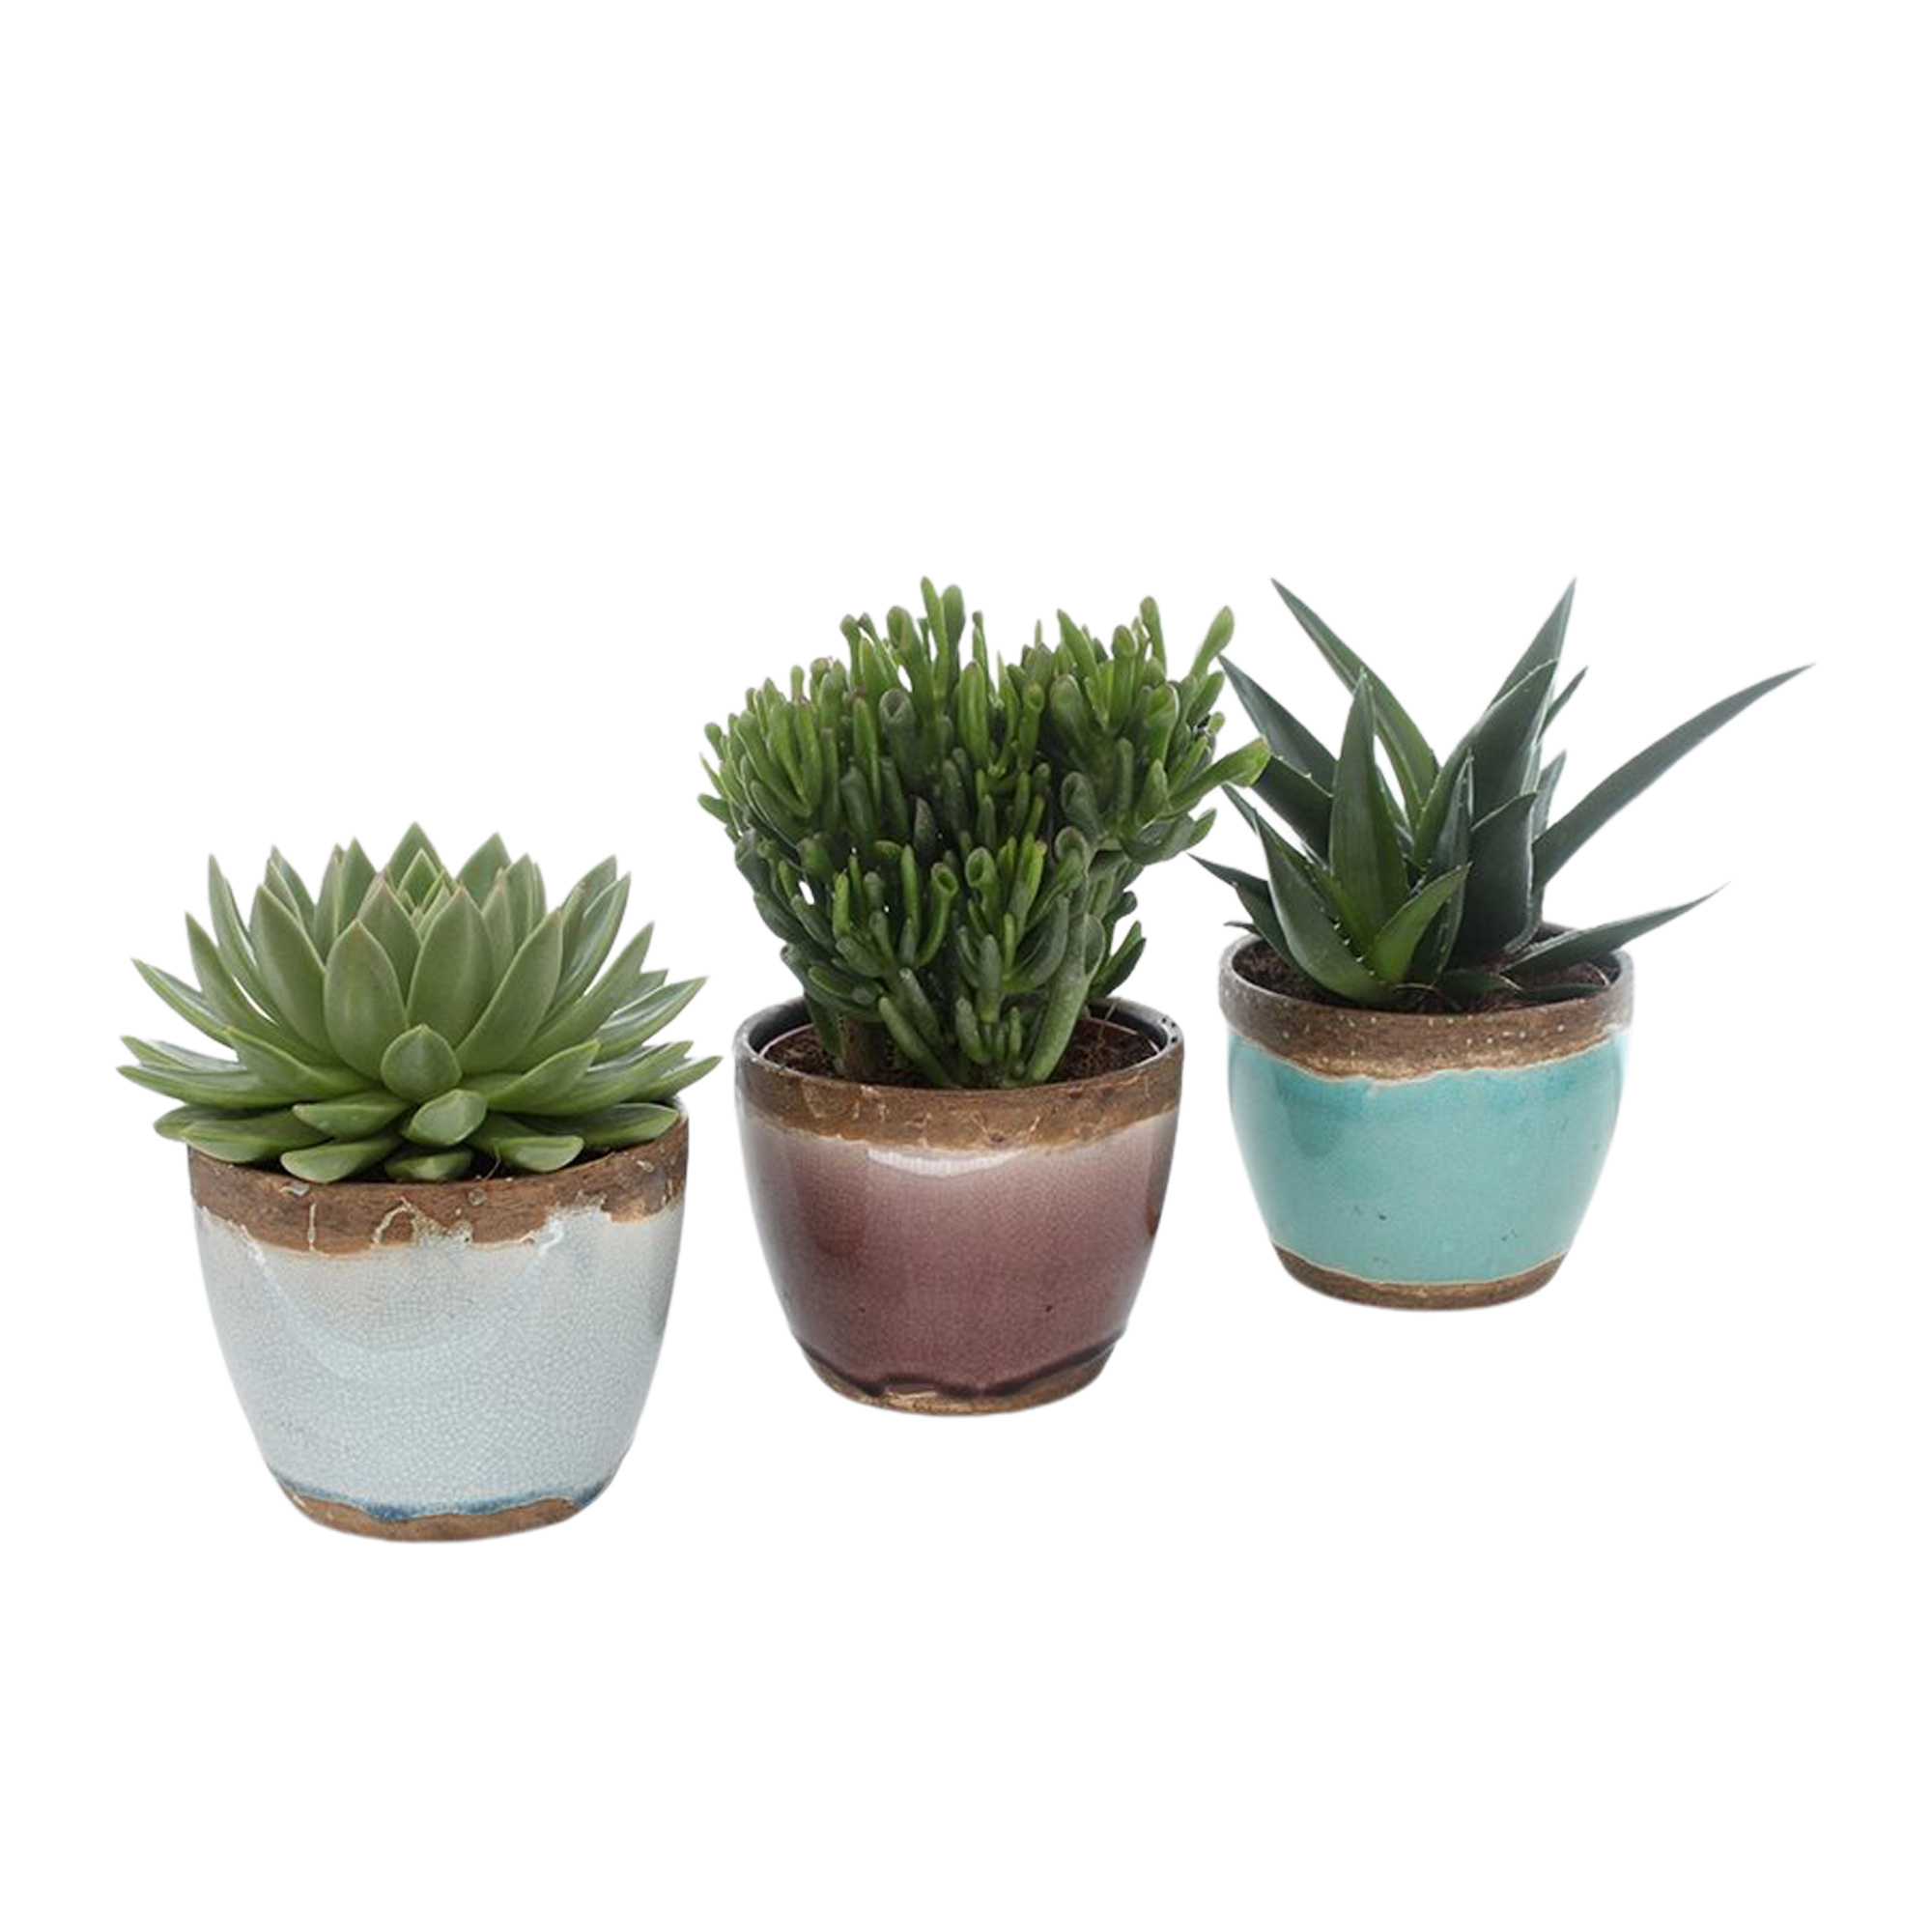 Set van 3 vetplanten in Old Look keramiek (AS202 - 15x20 cm)